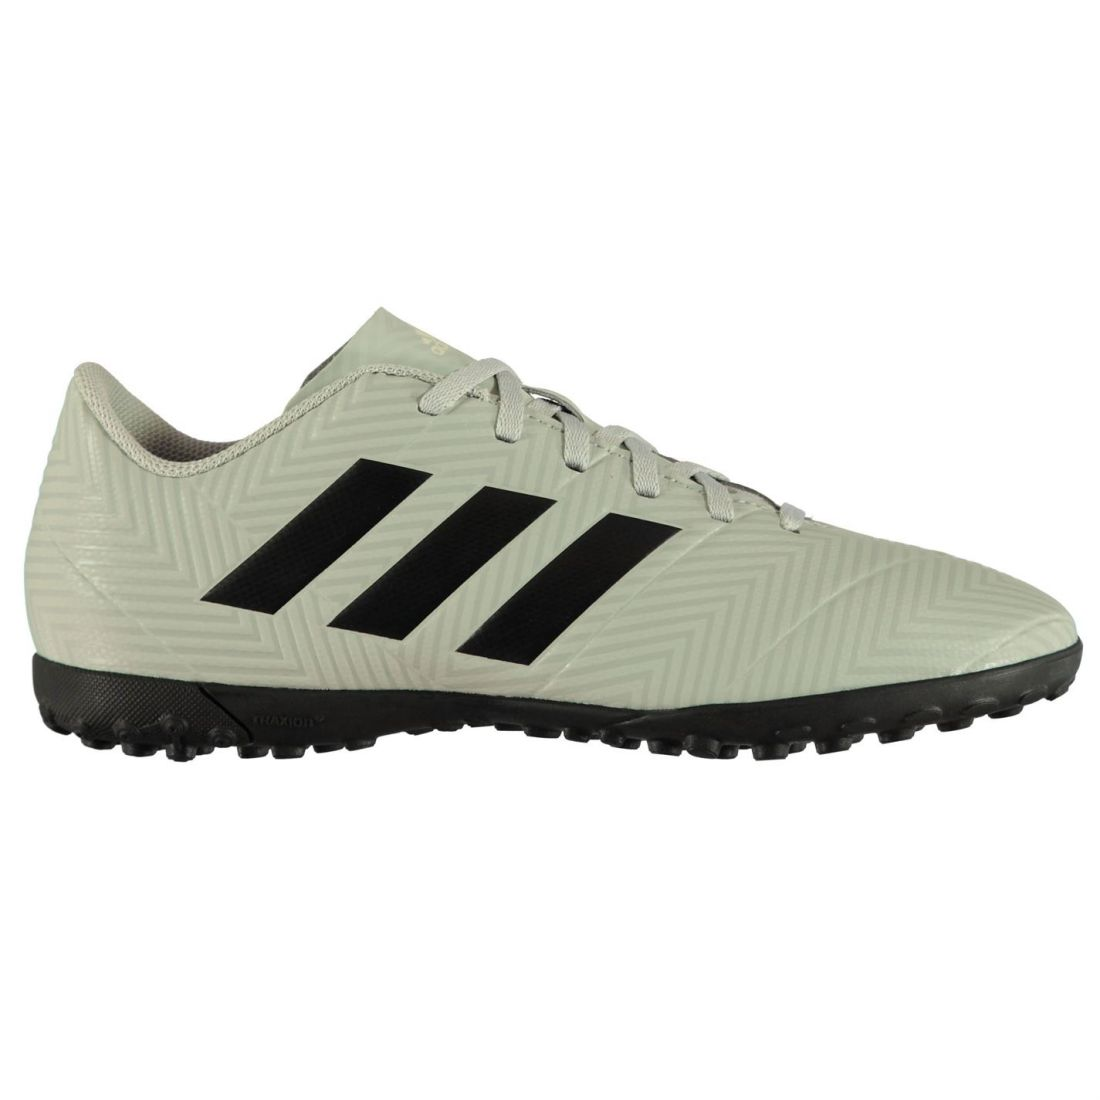 6d4b910cfbdb adidas Mens Nemeziz Tango 18.4 Astro Turf Trainers Football Boots ...